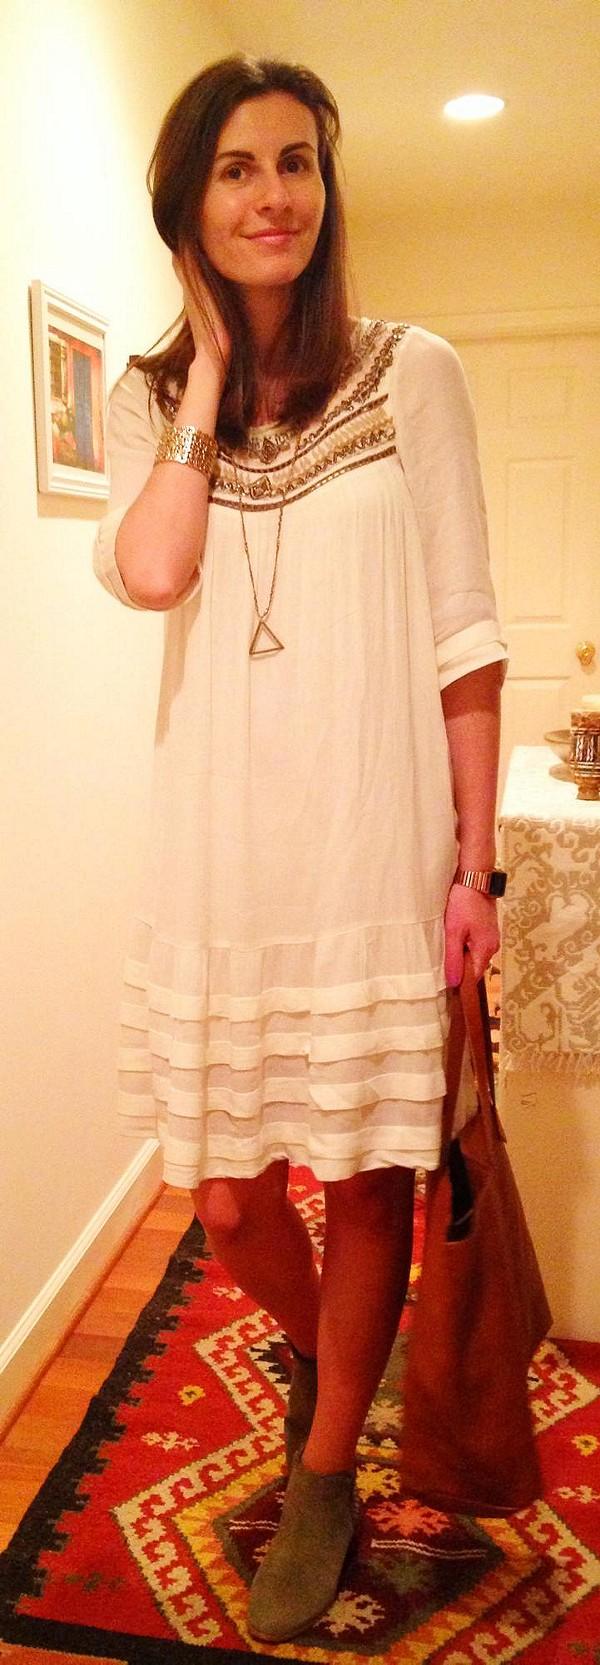 Ribbons And Rows Dress